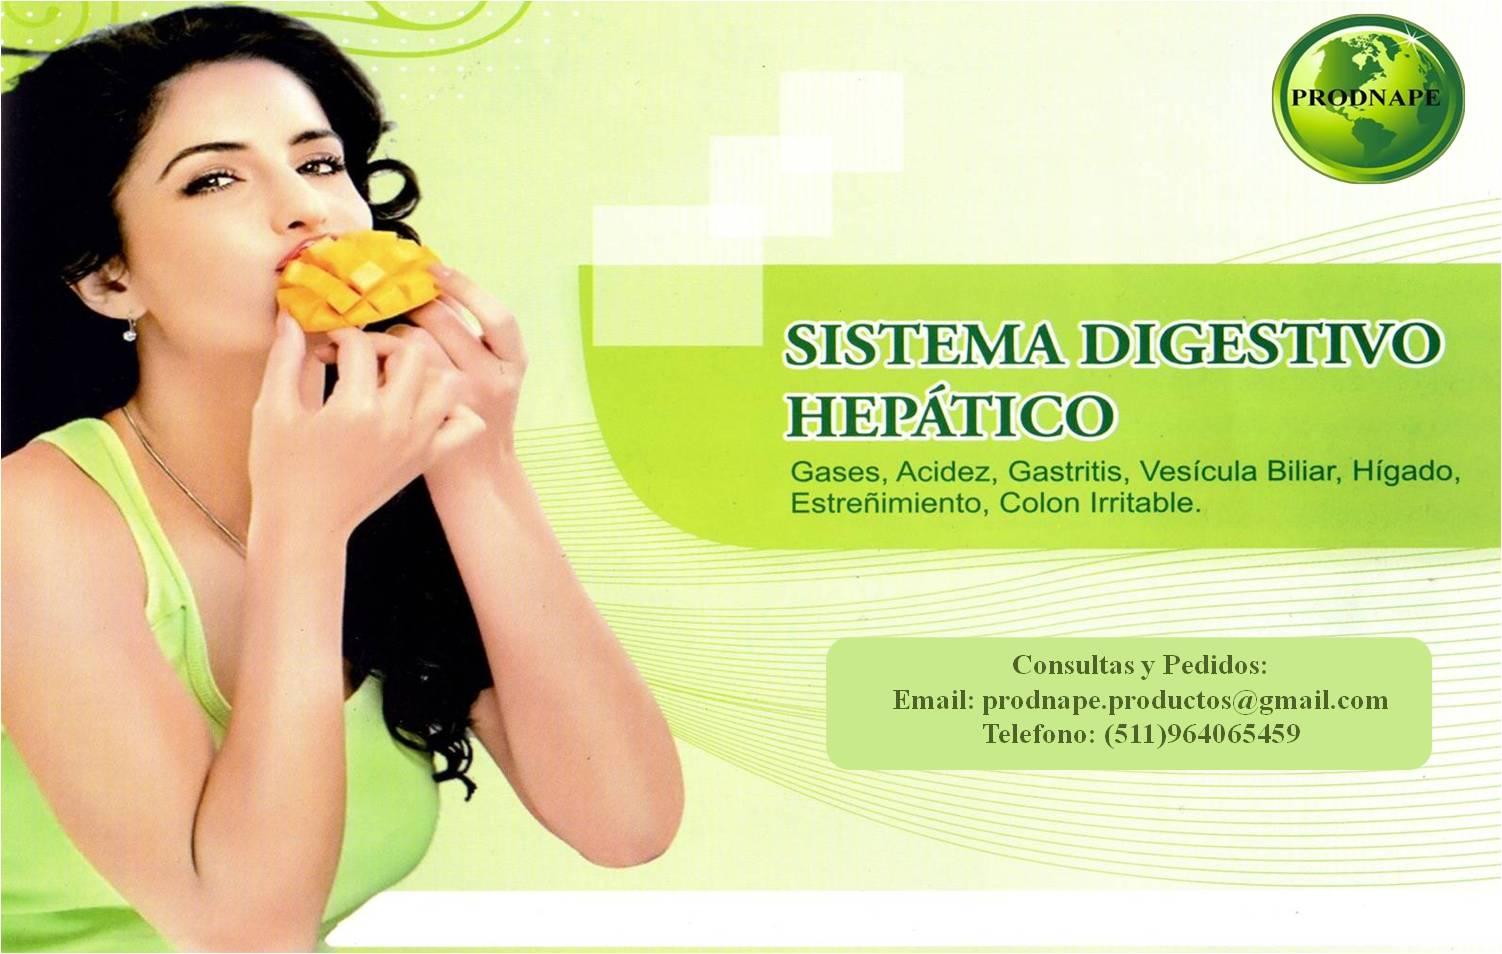 SISTEMA DIGESTIVO HEPATICO